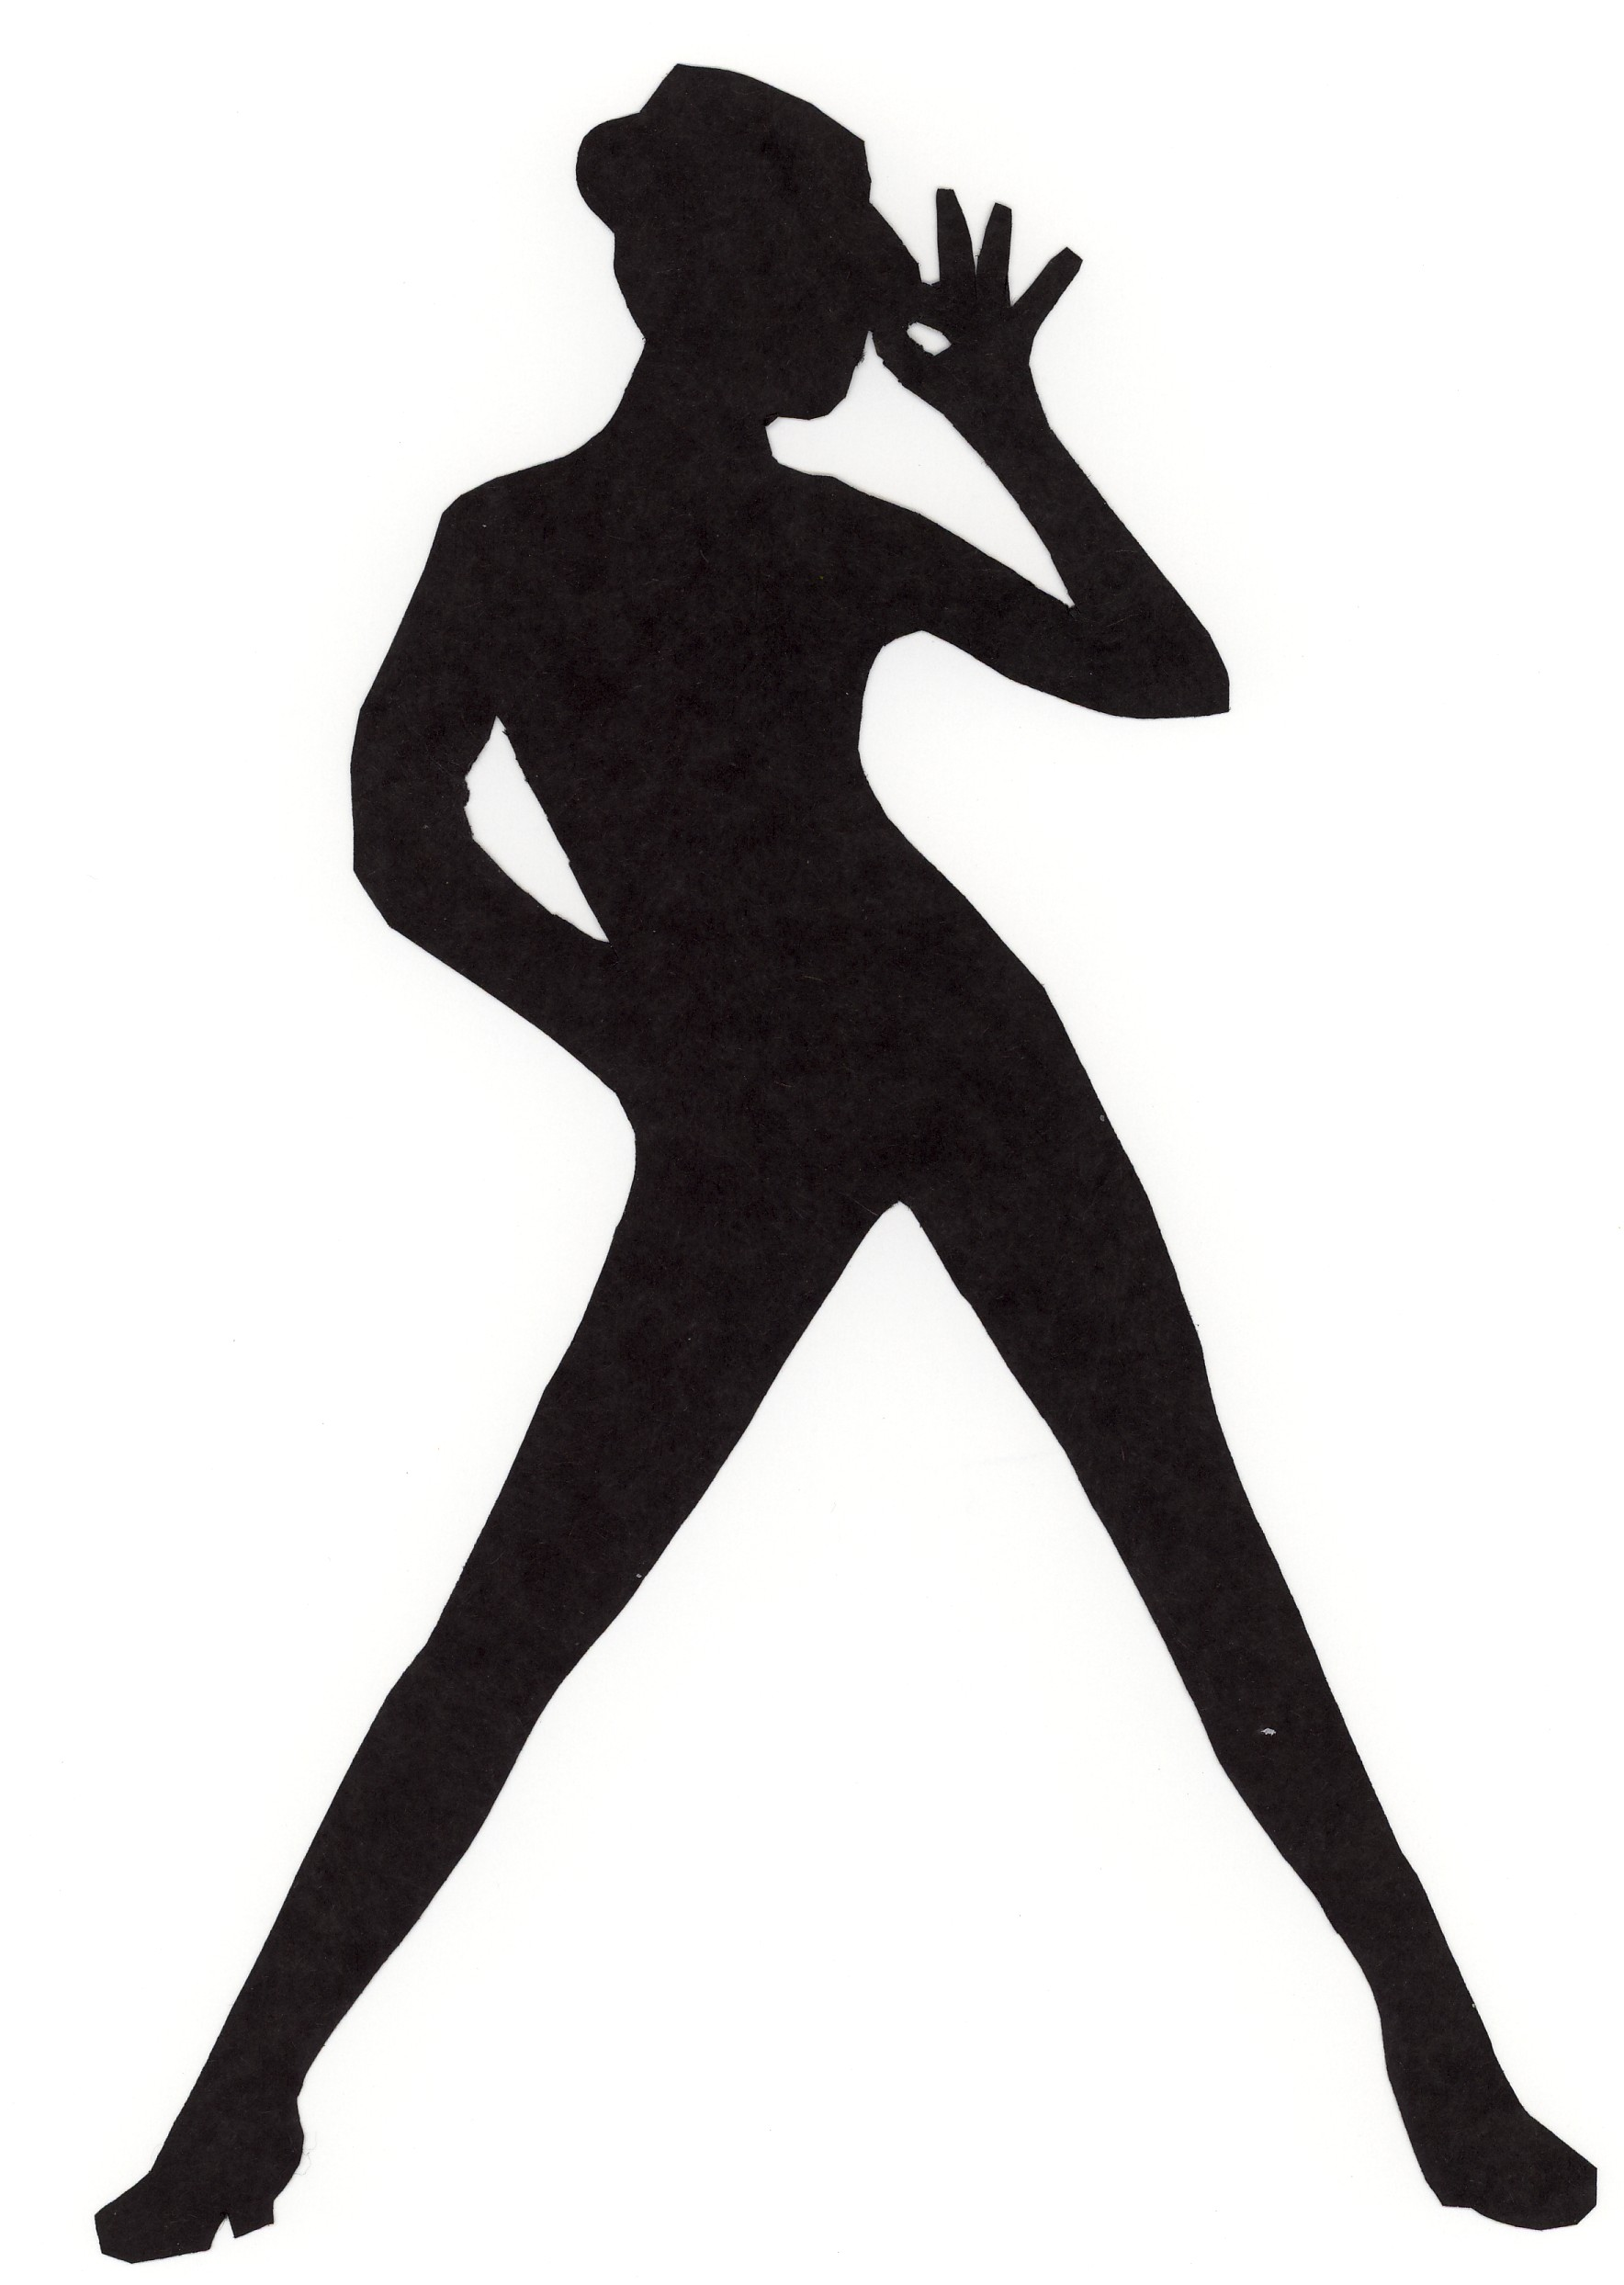 Shoe clipart jazz dance #4